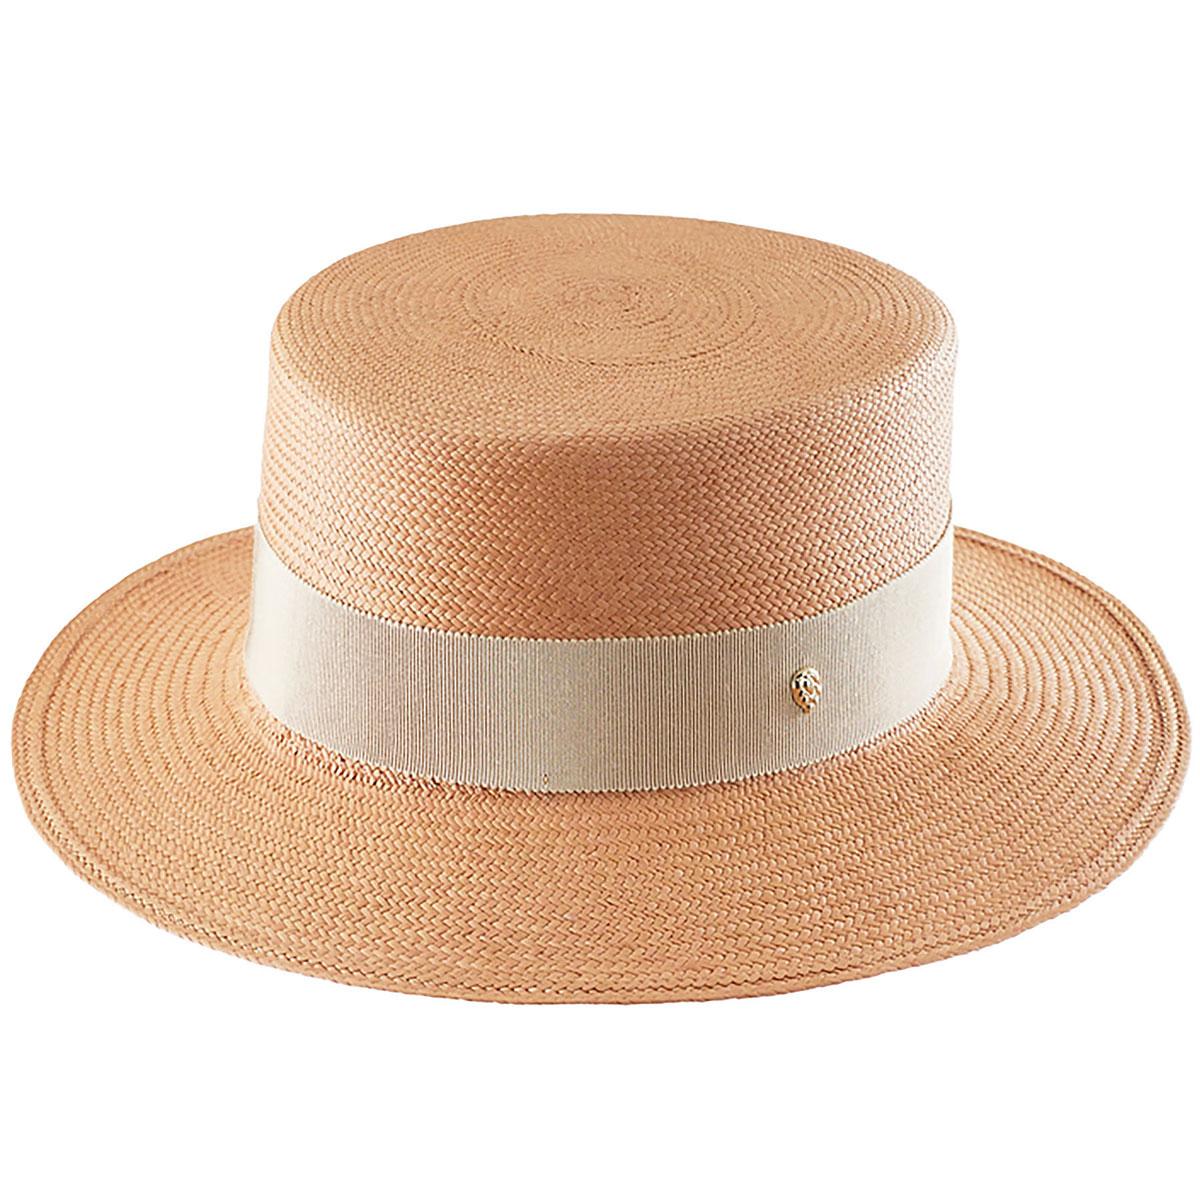 Edwardian Hats, Titanic Hats, Tea Party Hats Luisa Boater $320.00 AT vintagedancer.com